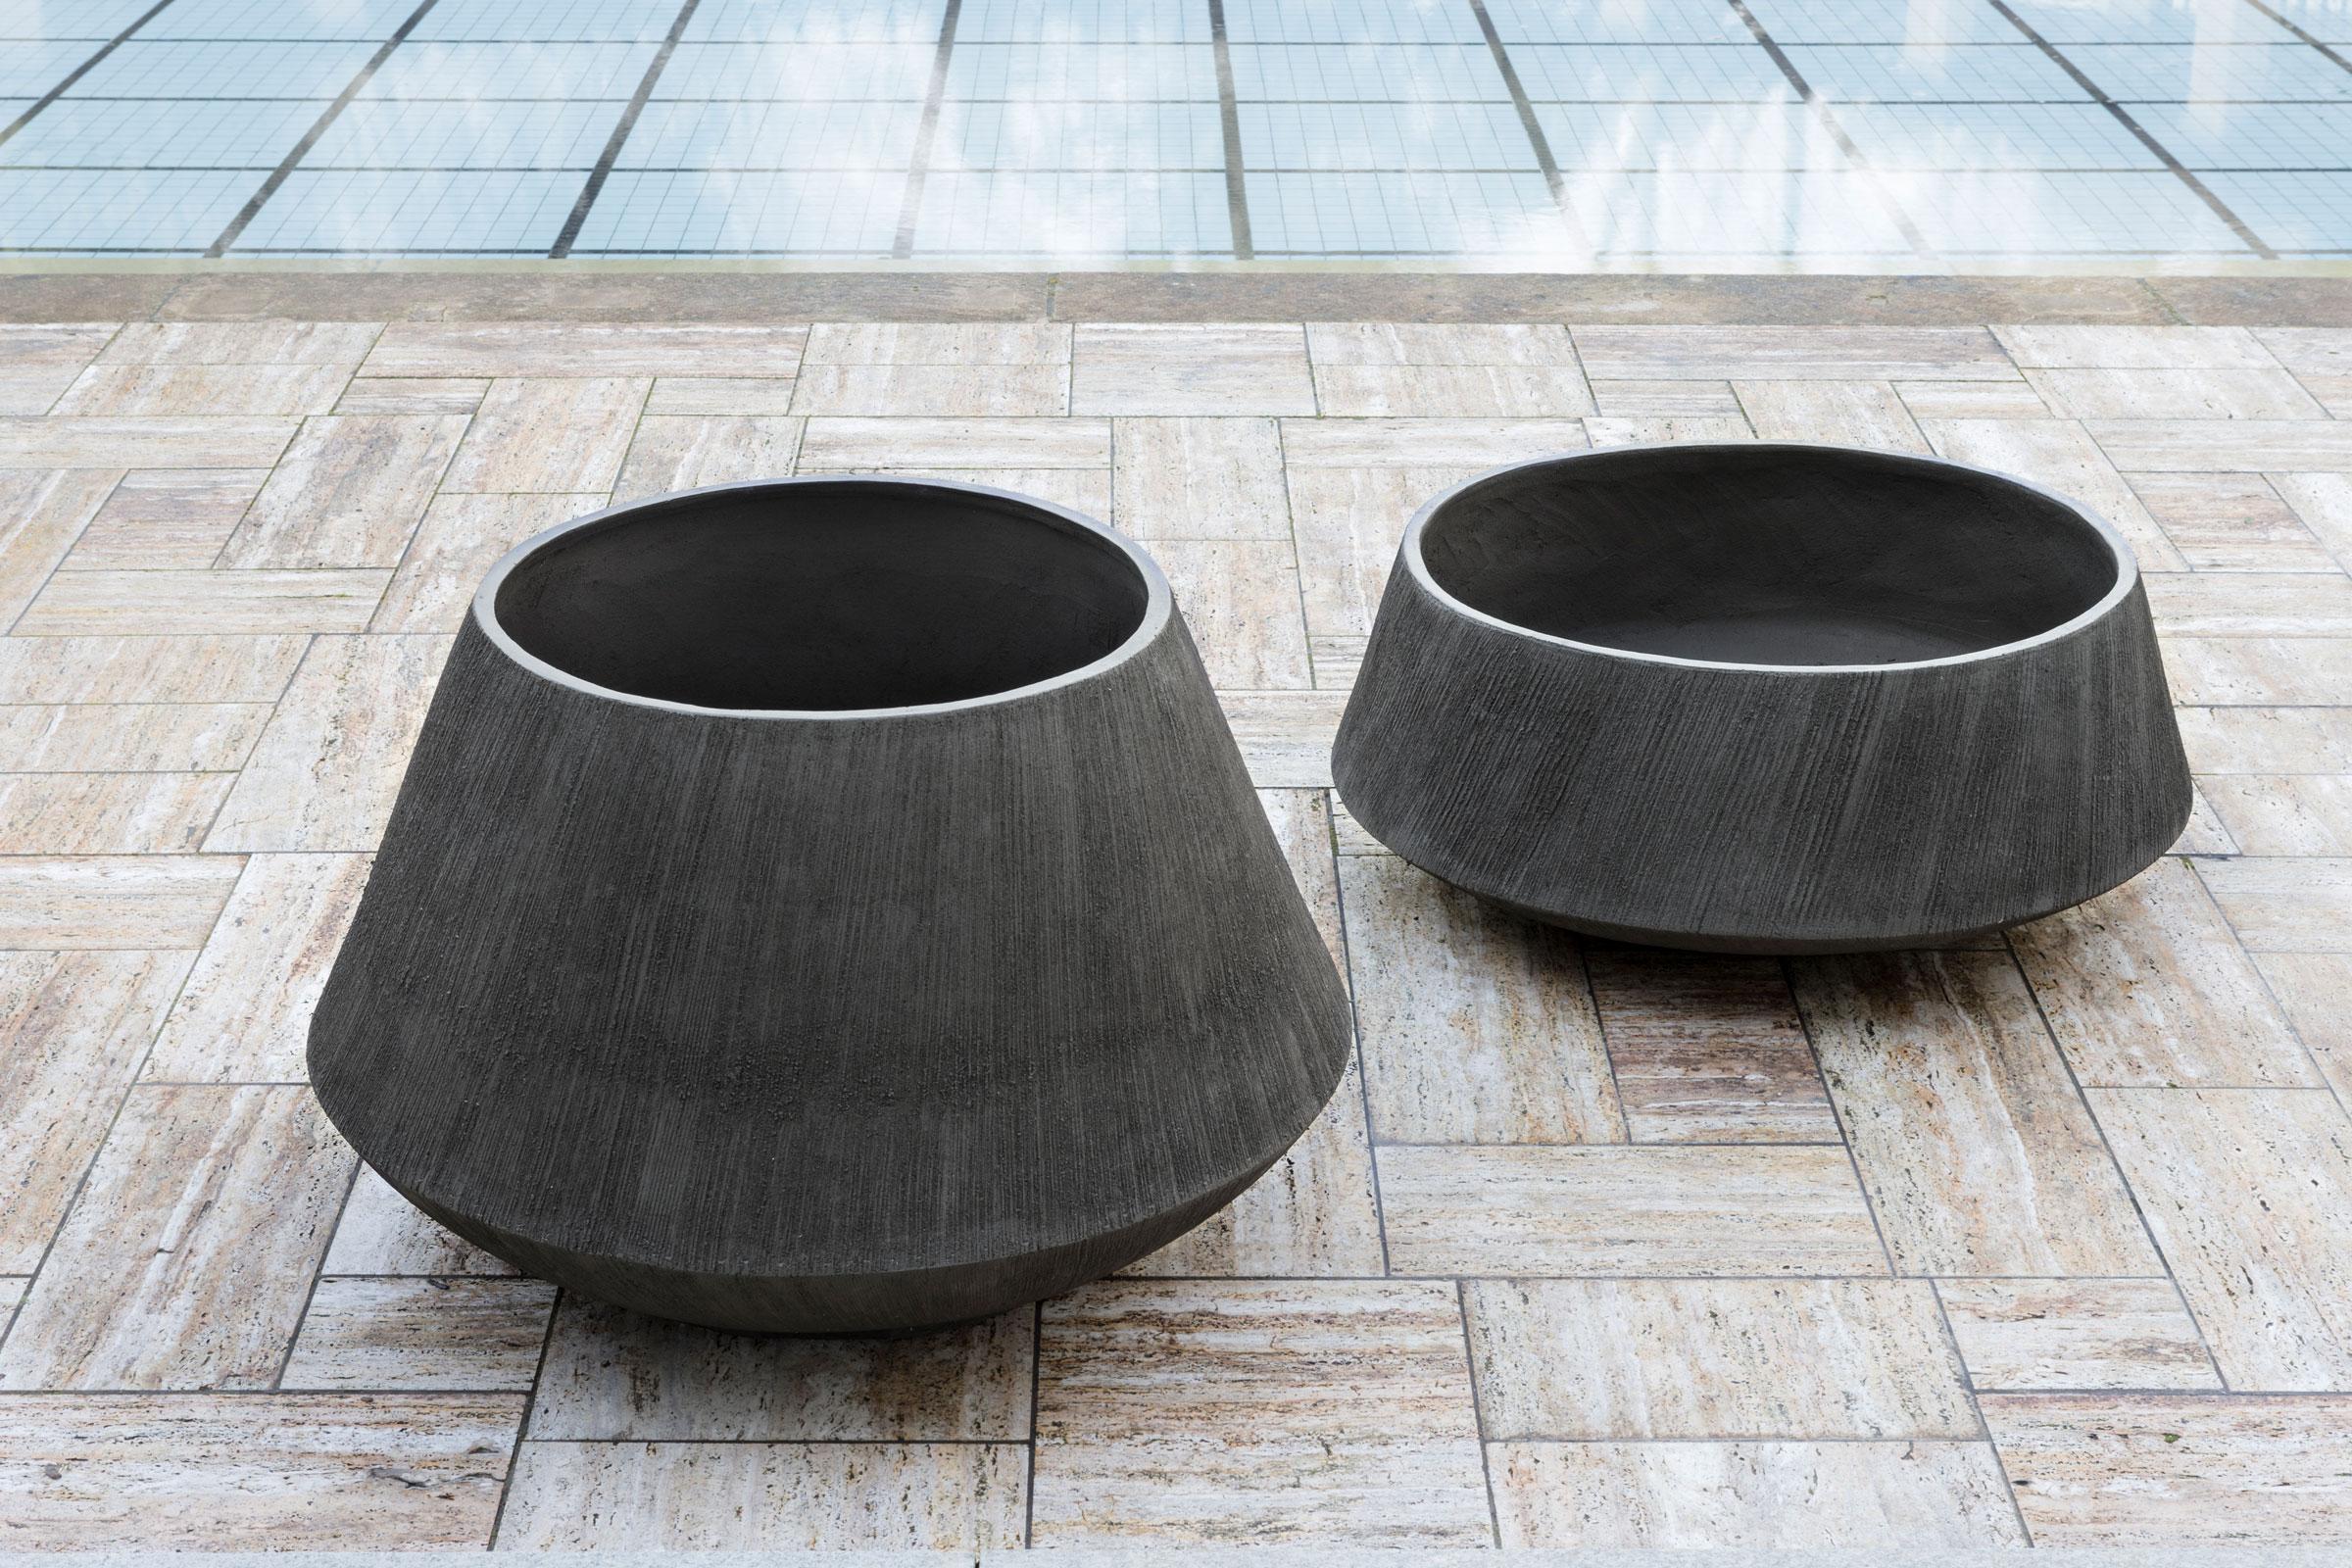 hauser-design-atelier-vierkant-in-anthrazit